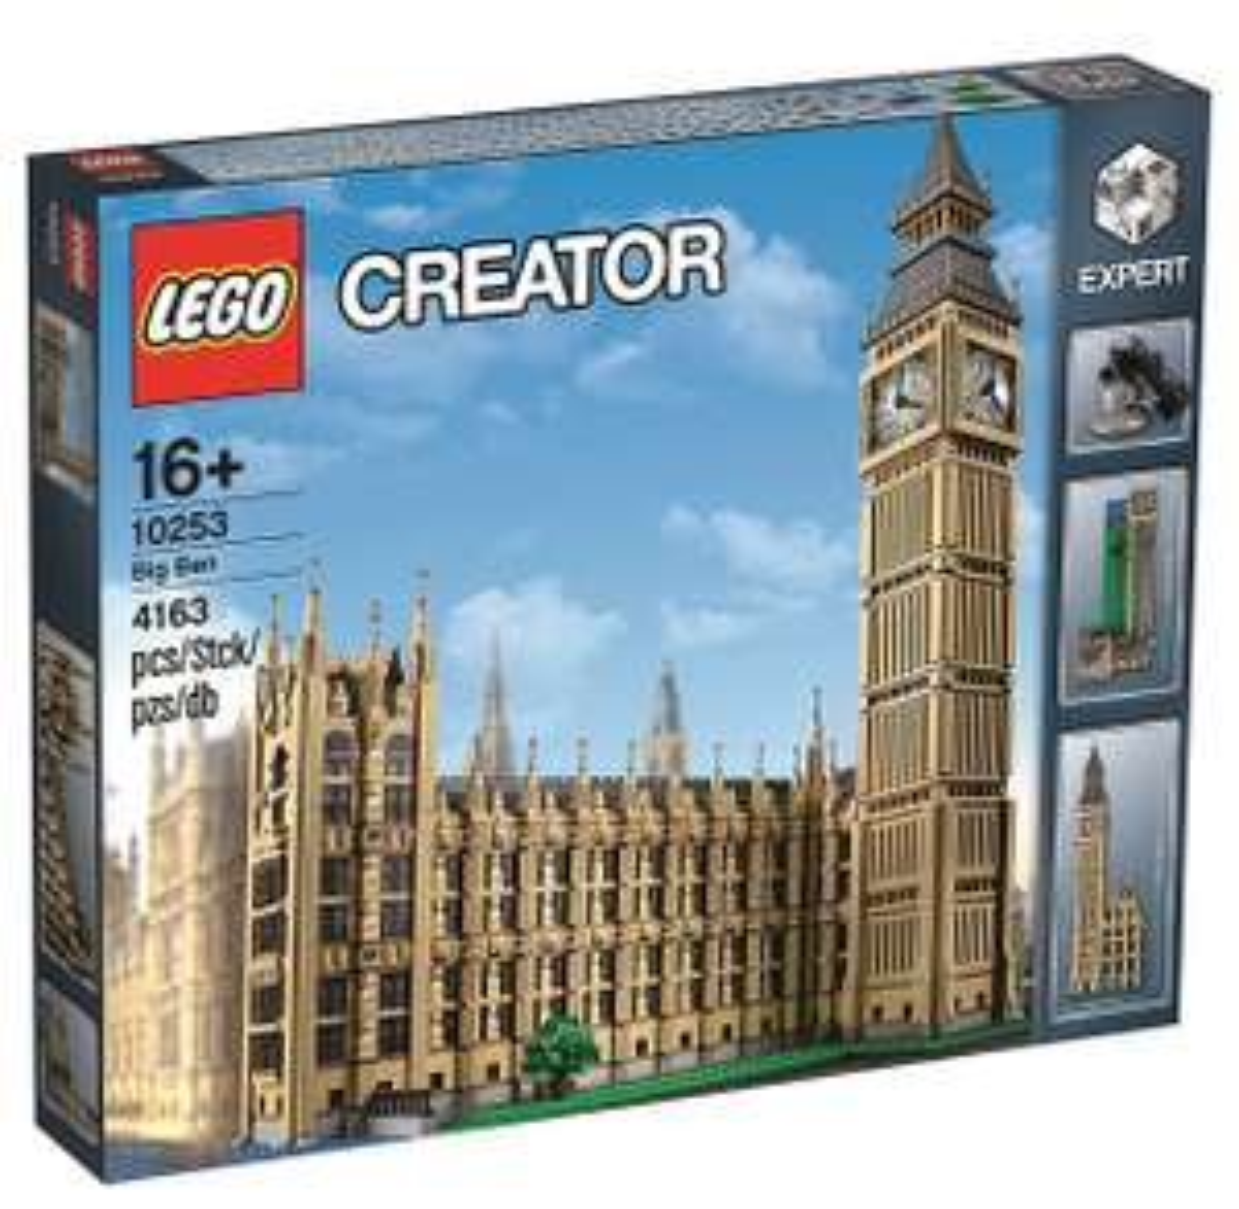 LEGO Creator Expert 10253 Big Ben - £148.98 @ John Lewis